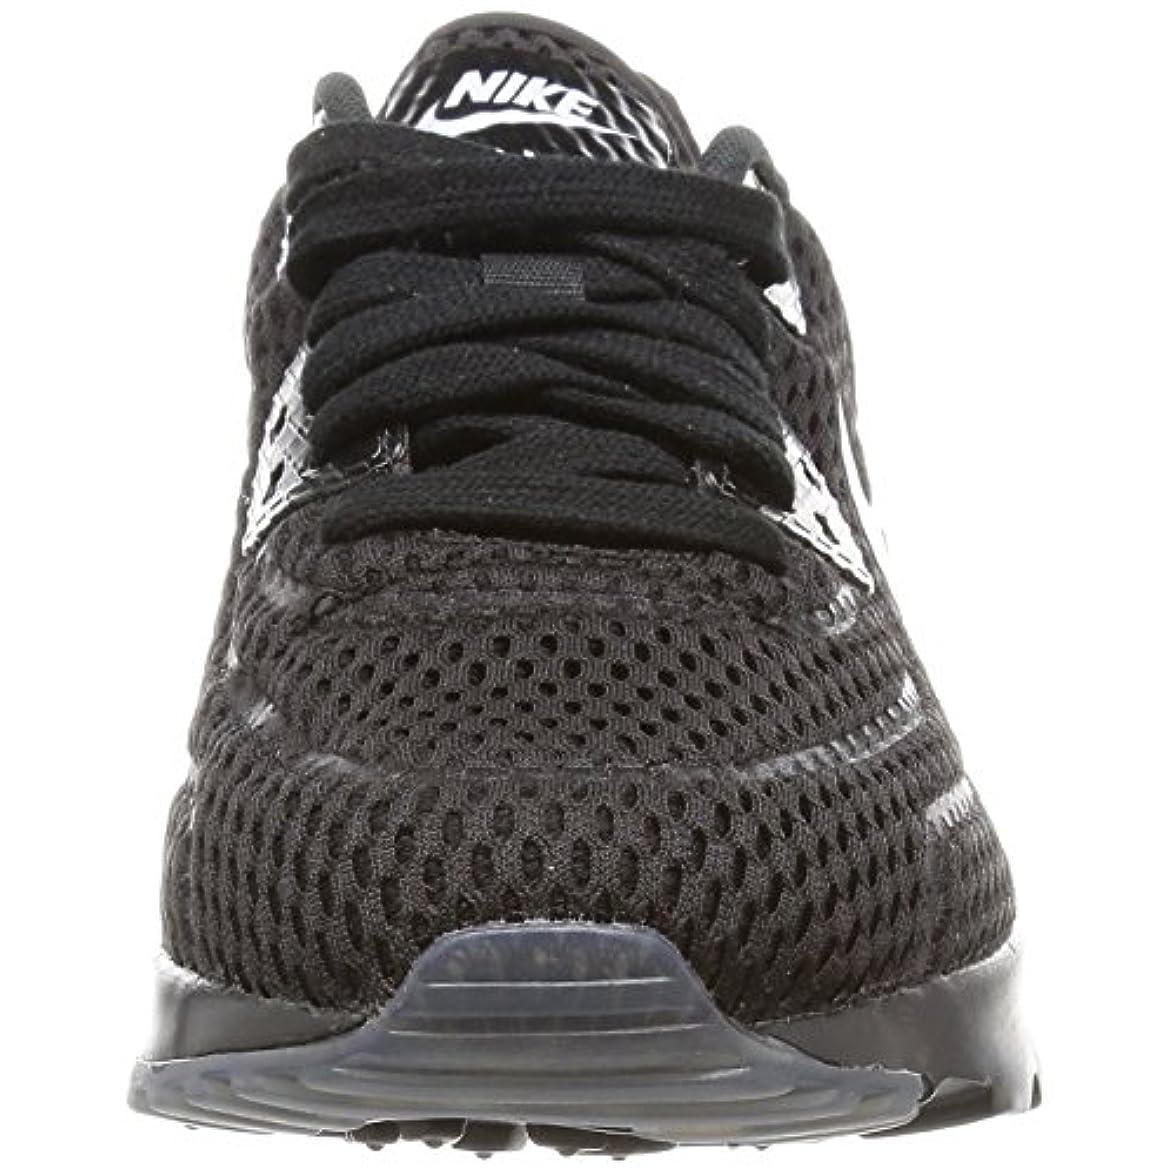 Nike W Air Max 90 Ultra Br Scarpe Da Ginnastica Donna